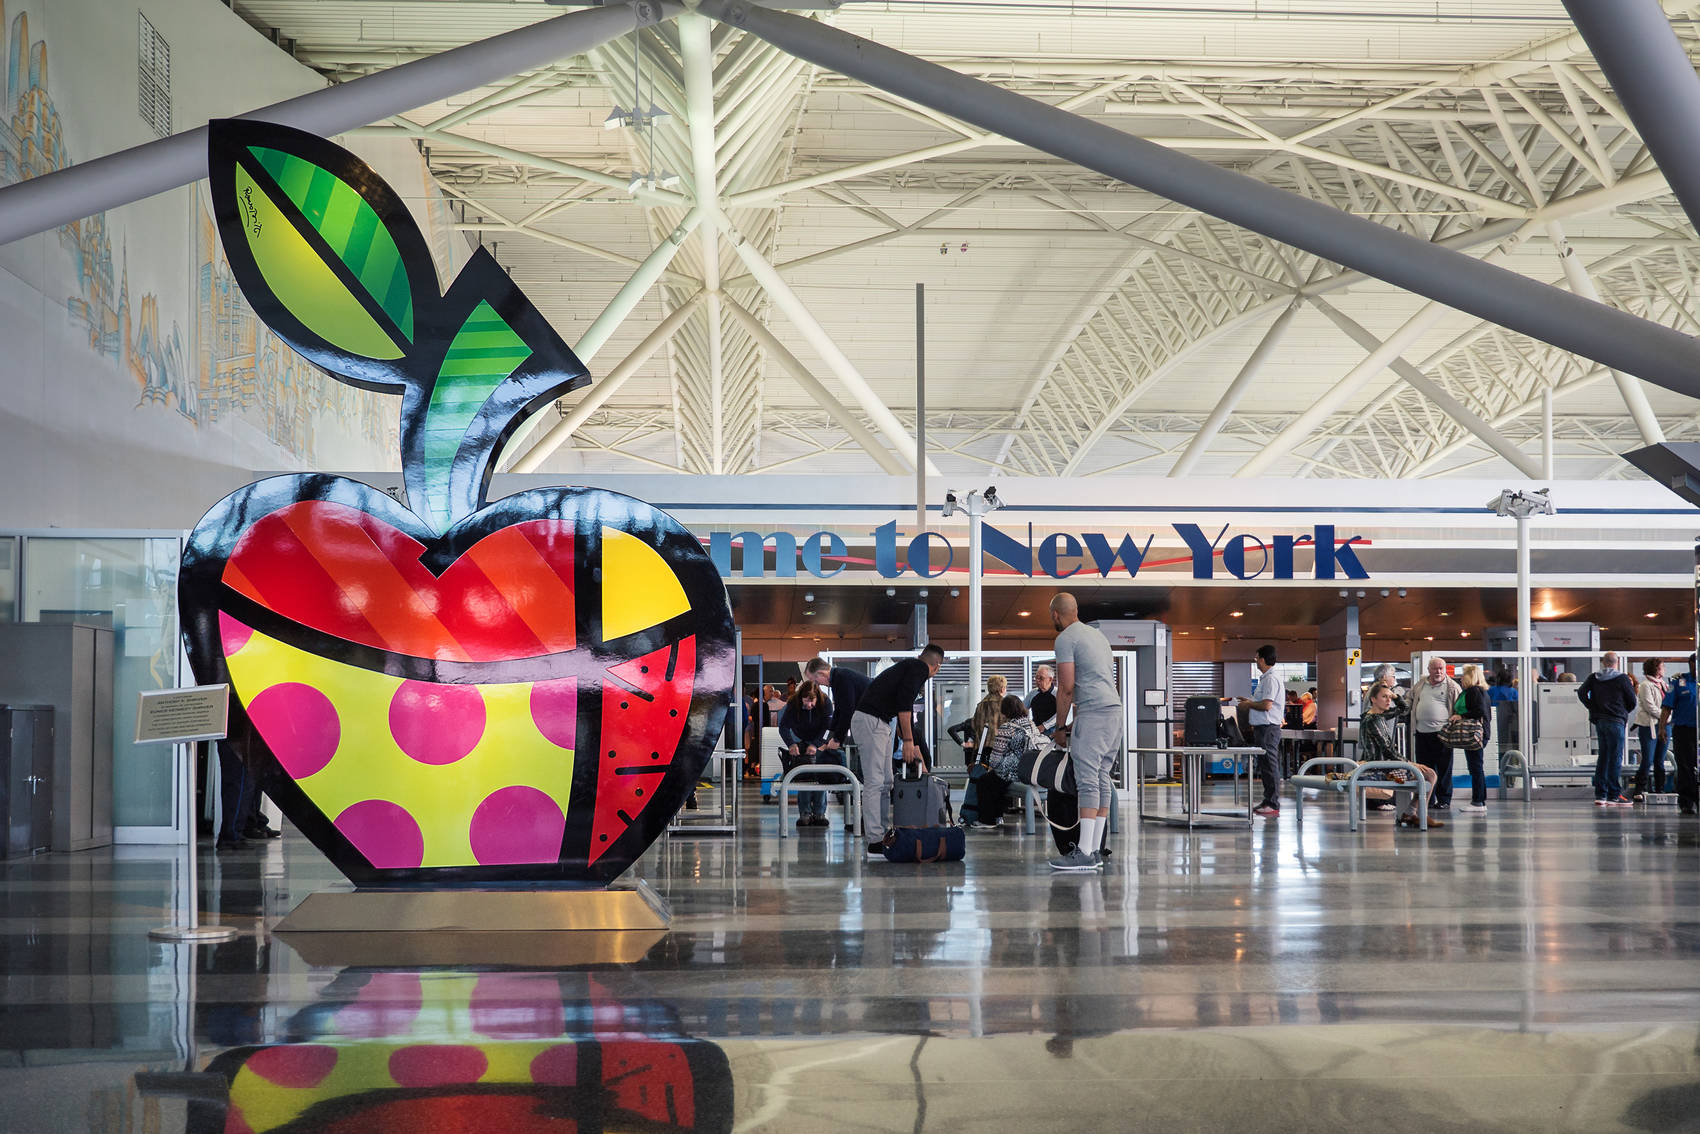 JFK-New-York-airport-stop-over